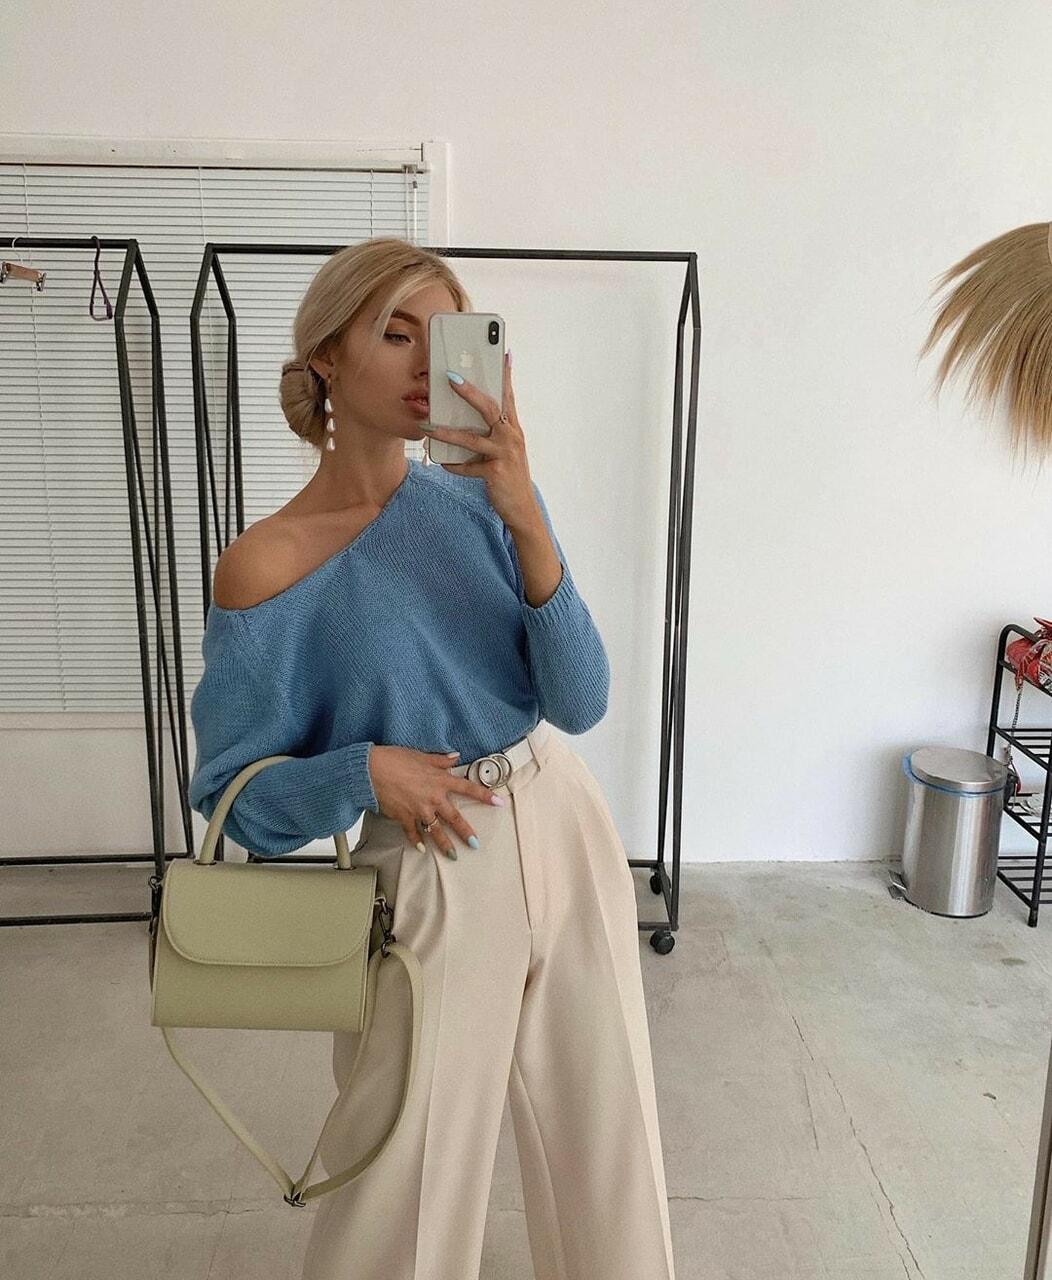 article, fashion, and career advice image